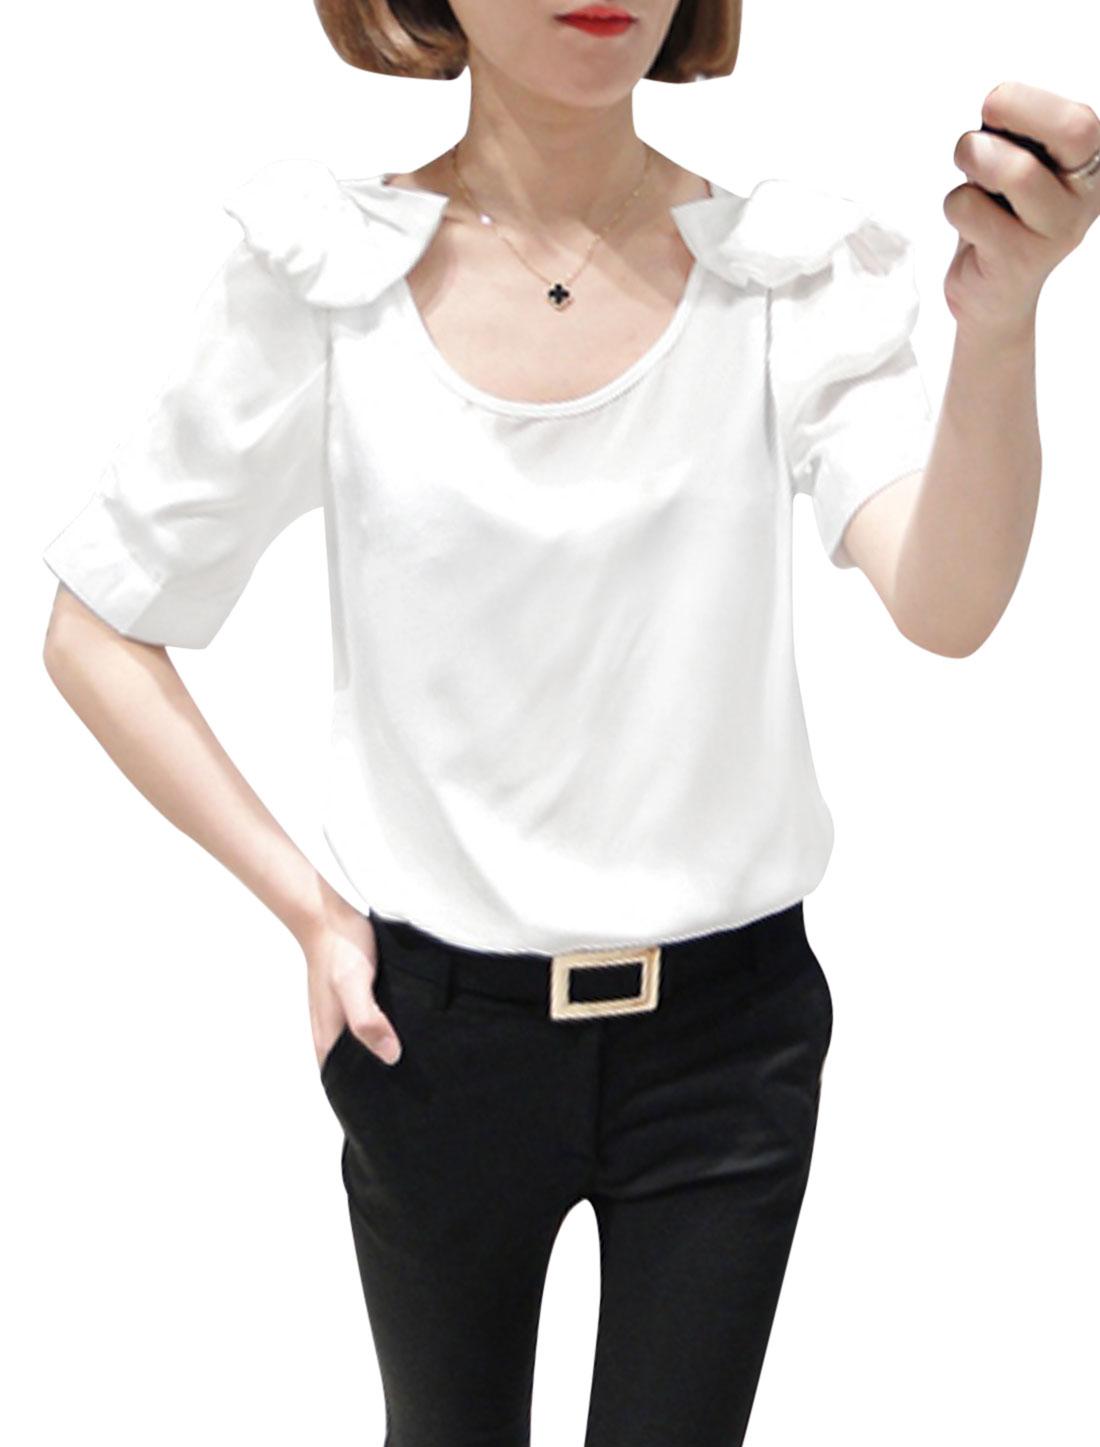 Women Stylish Short Sleeve Cut Out Shoulder Bowknot Decor Blouse White XS